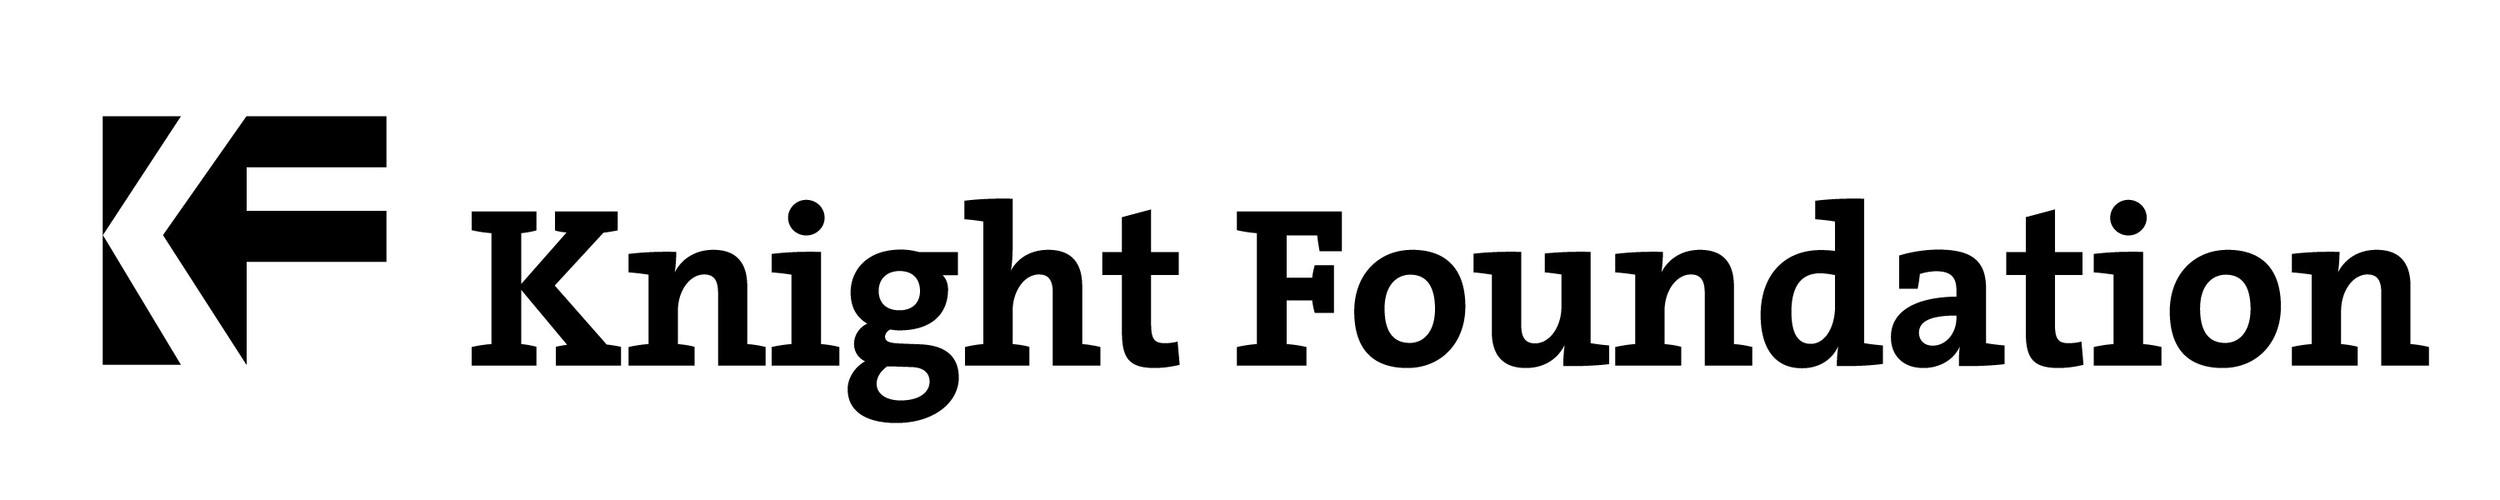 knight-logo-black-3000.jpeg